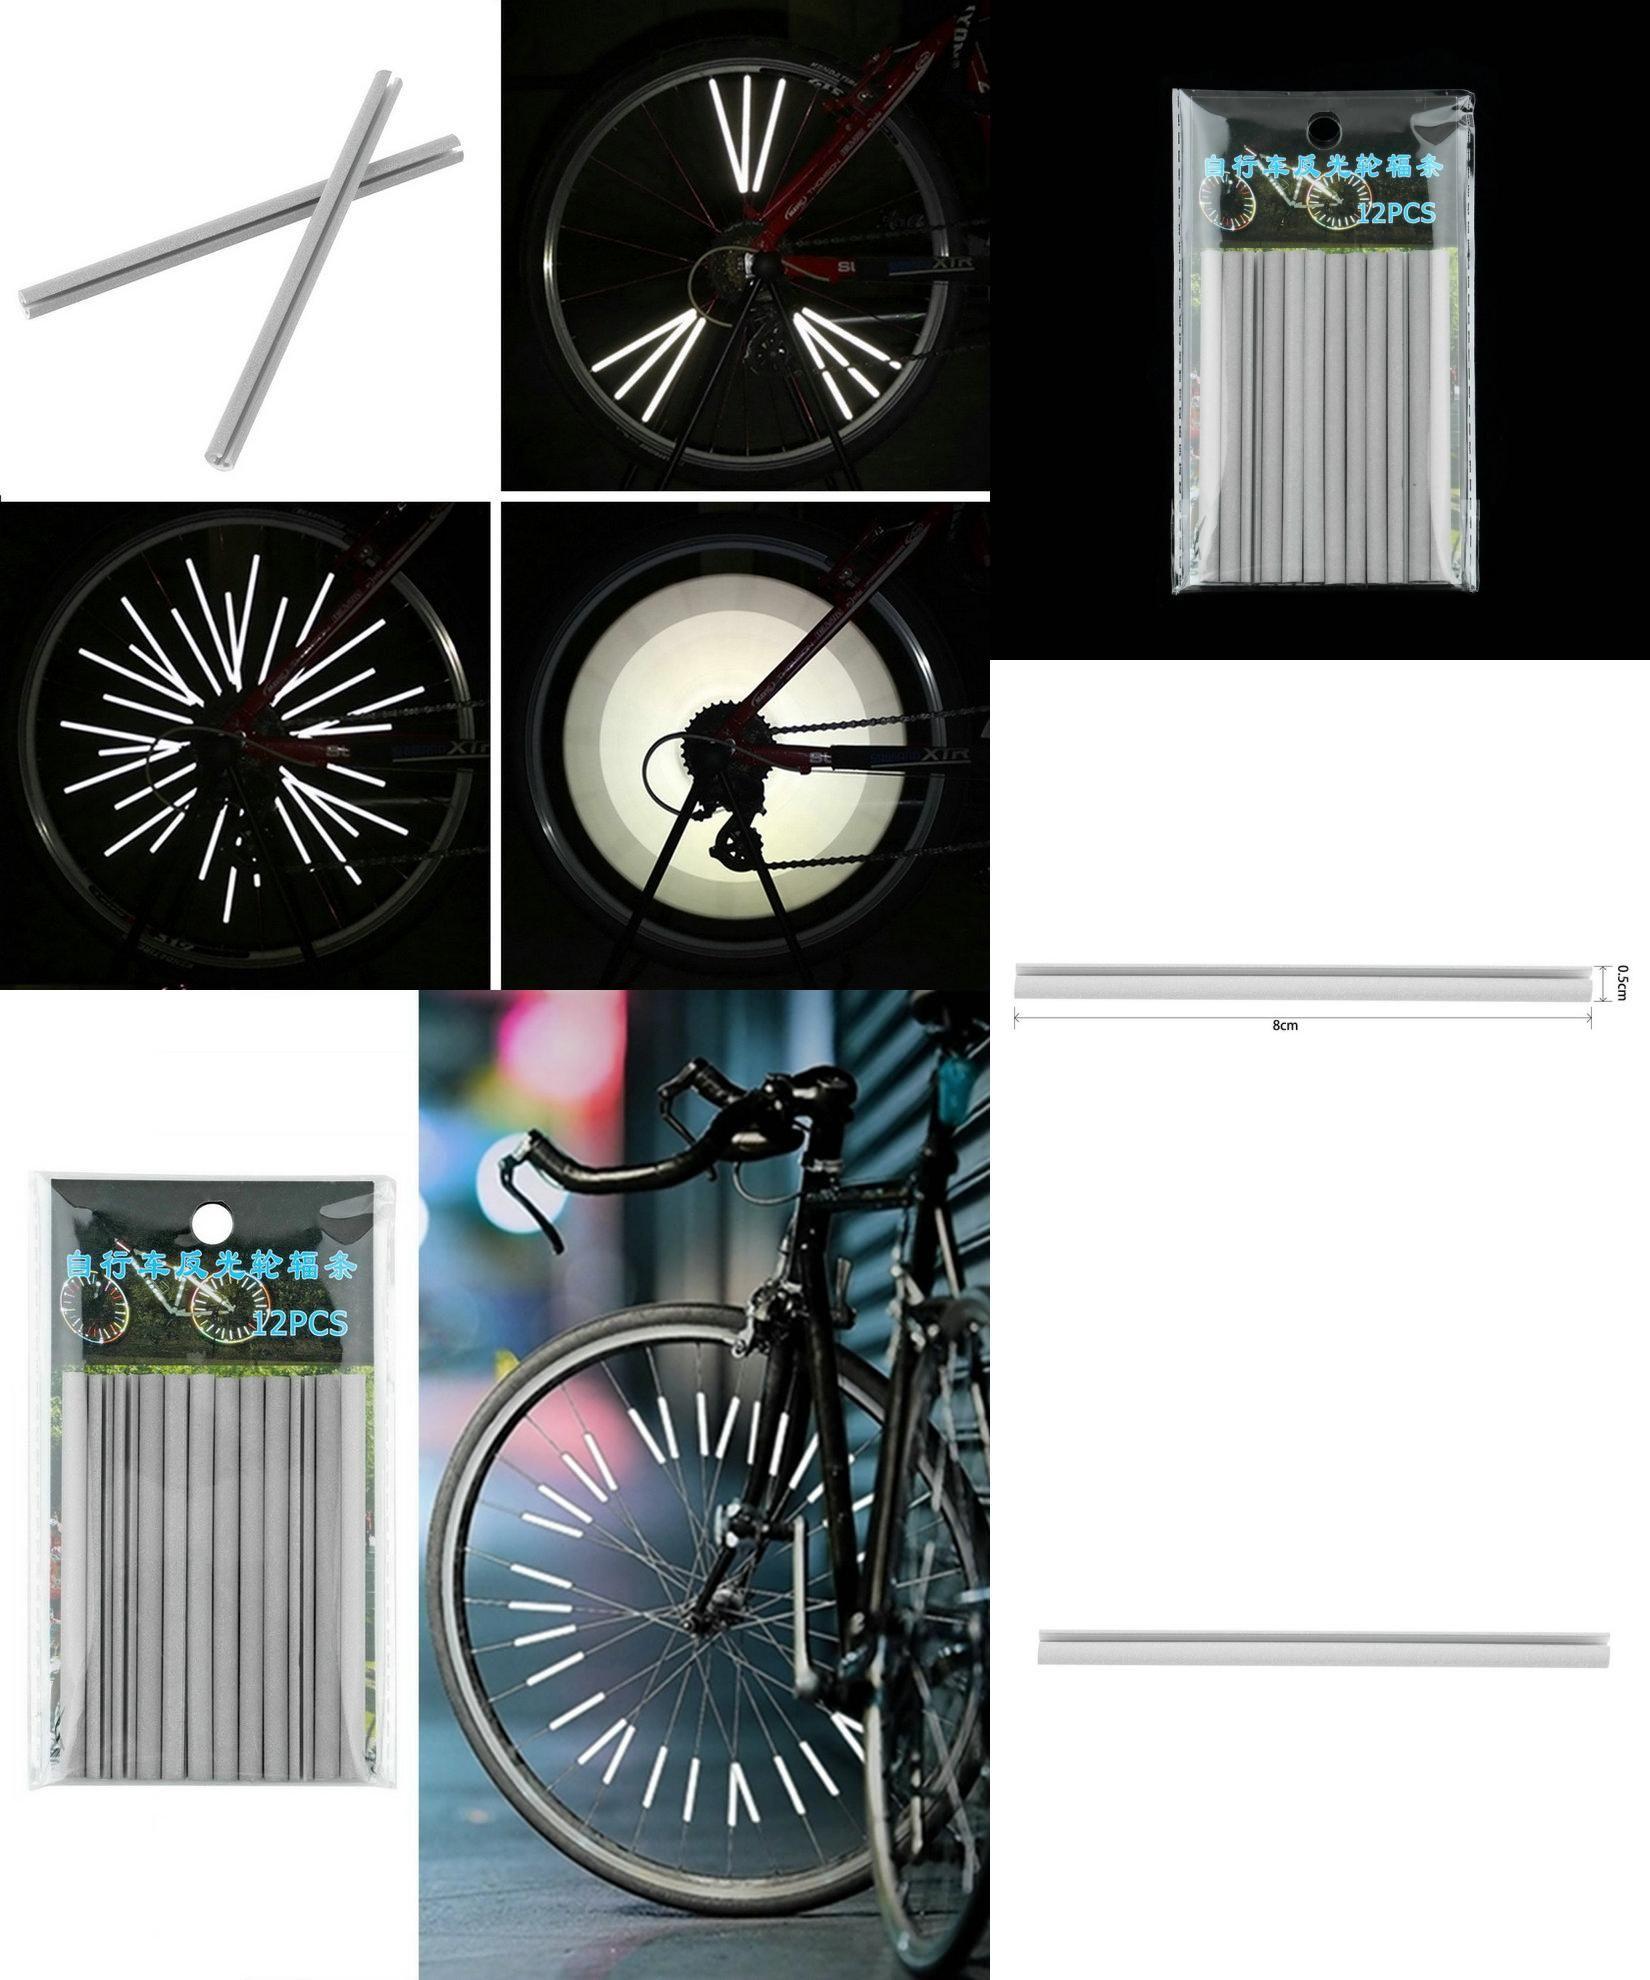 39d2017b064 [Visit to Buy] 12pcs/set Bicycle Wheel Spoke Reflector Reflective Mount  Clip Wheel Rim Spoke Bike Mount Strip Reflector Warning Light Tube  #Advertisement